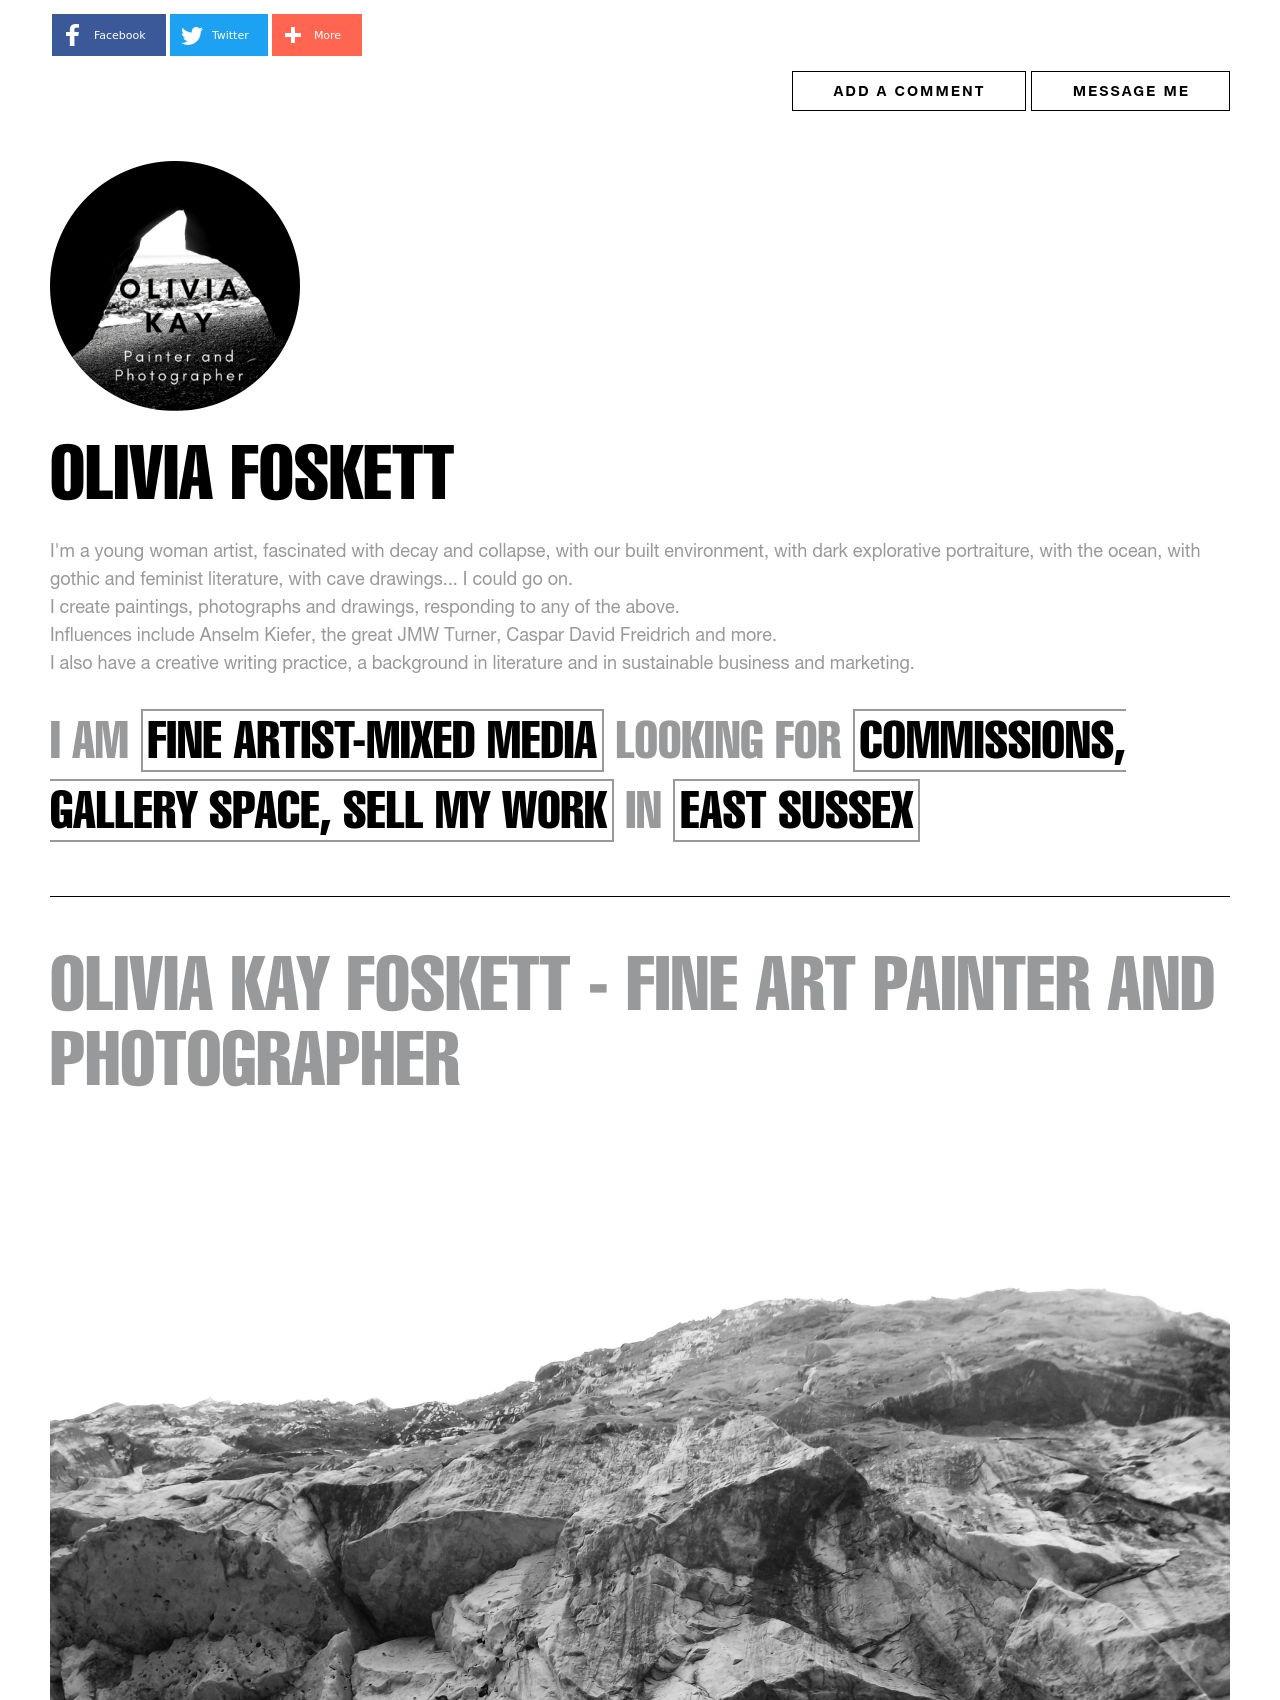 Olivia Foskett